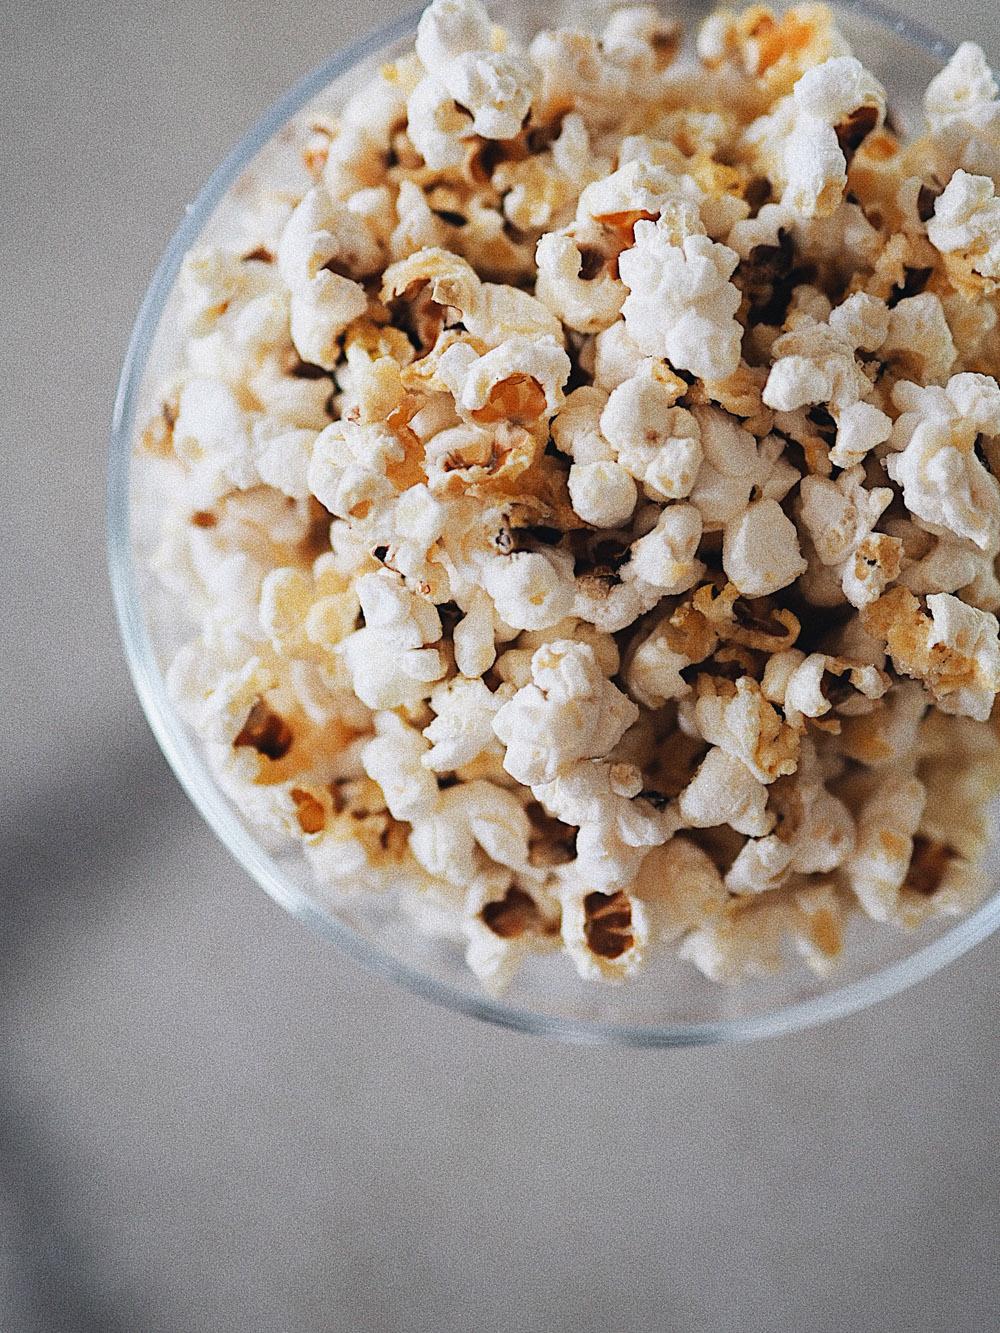 Foodblog_Rezept_Snack_essig_popcorn